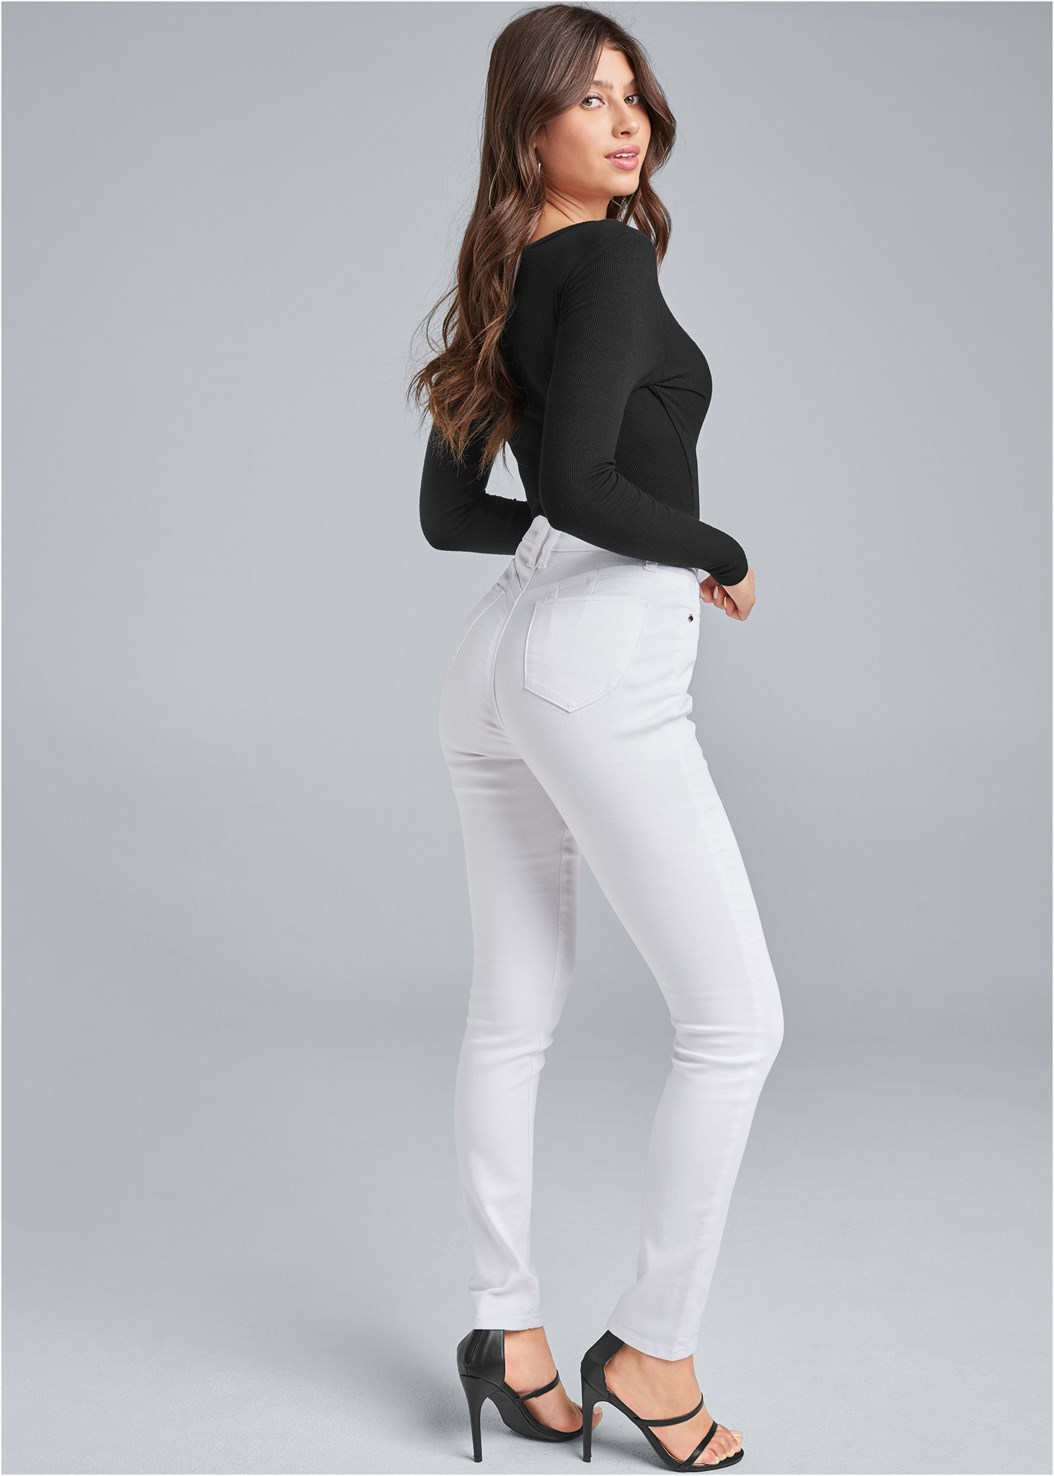 Bum Lifter Jeans,Button Up Bodysuit,High Heel Strappy Sandals,Print Detail Handbag